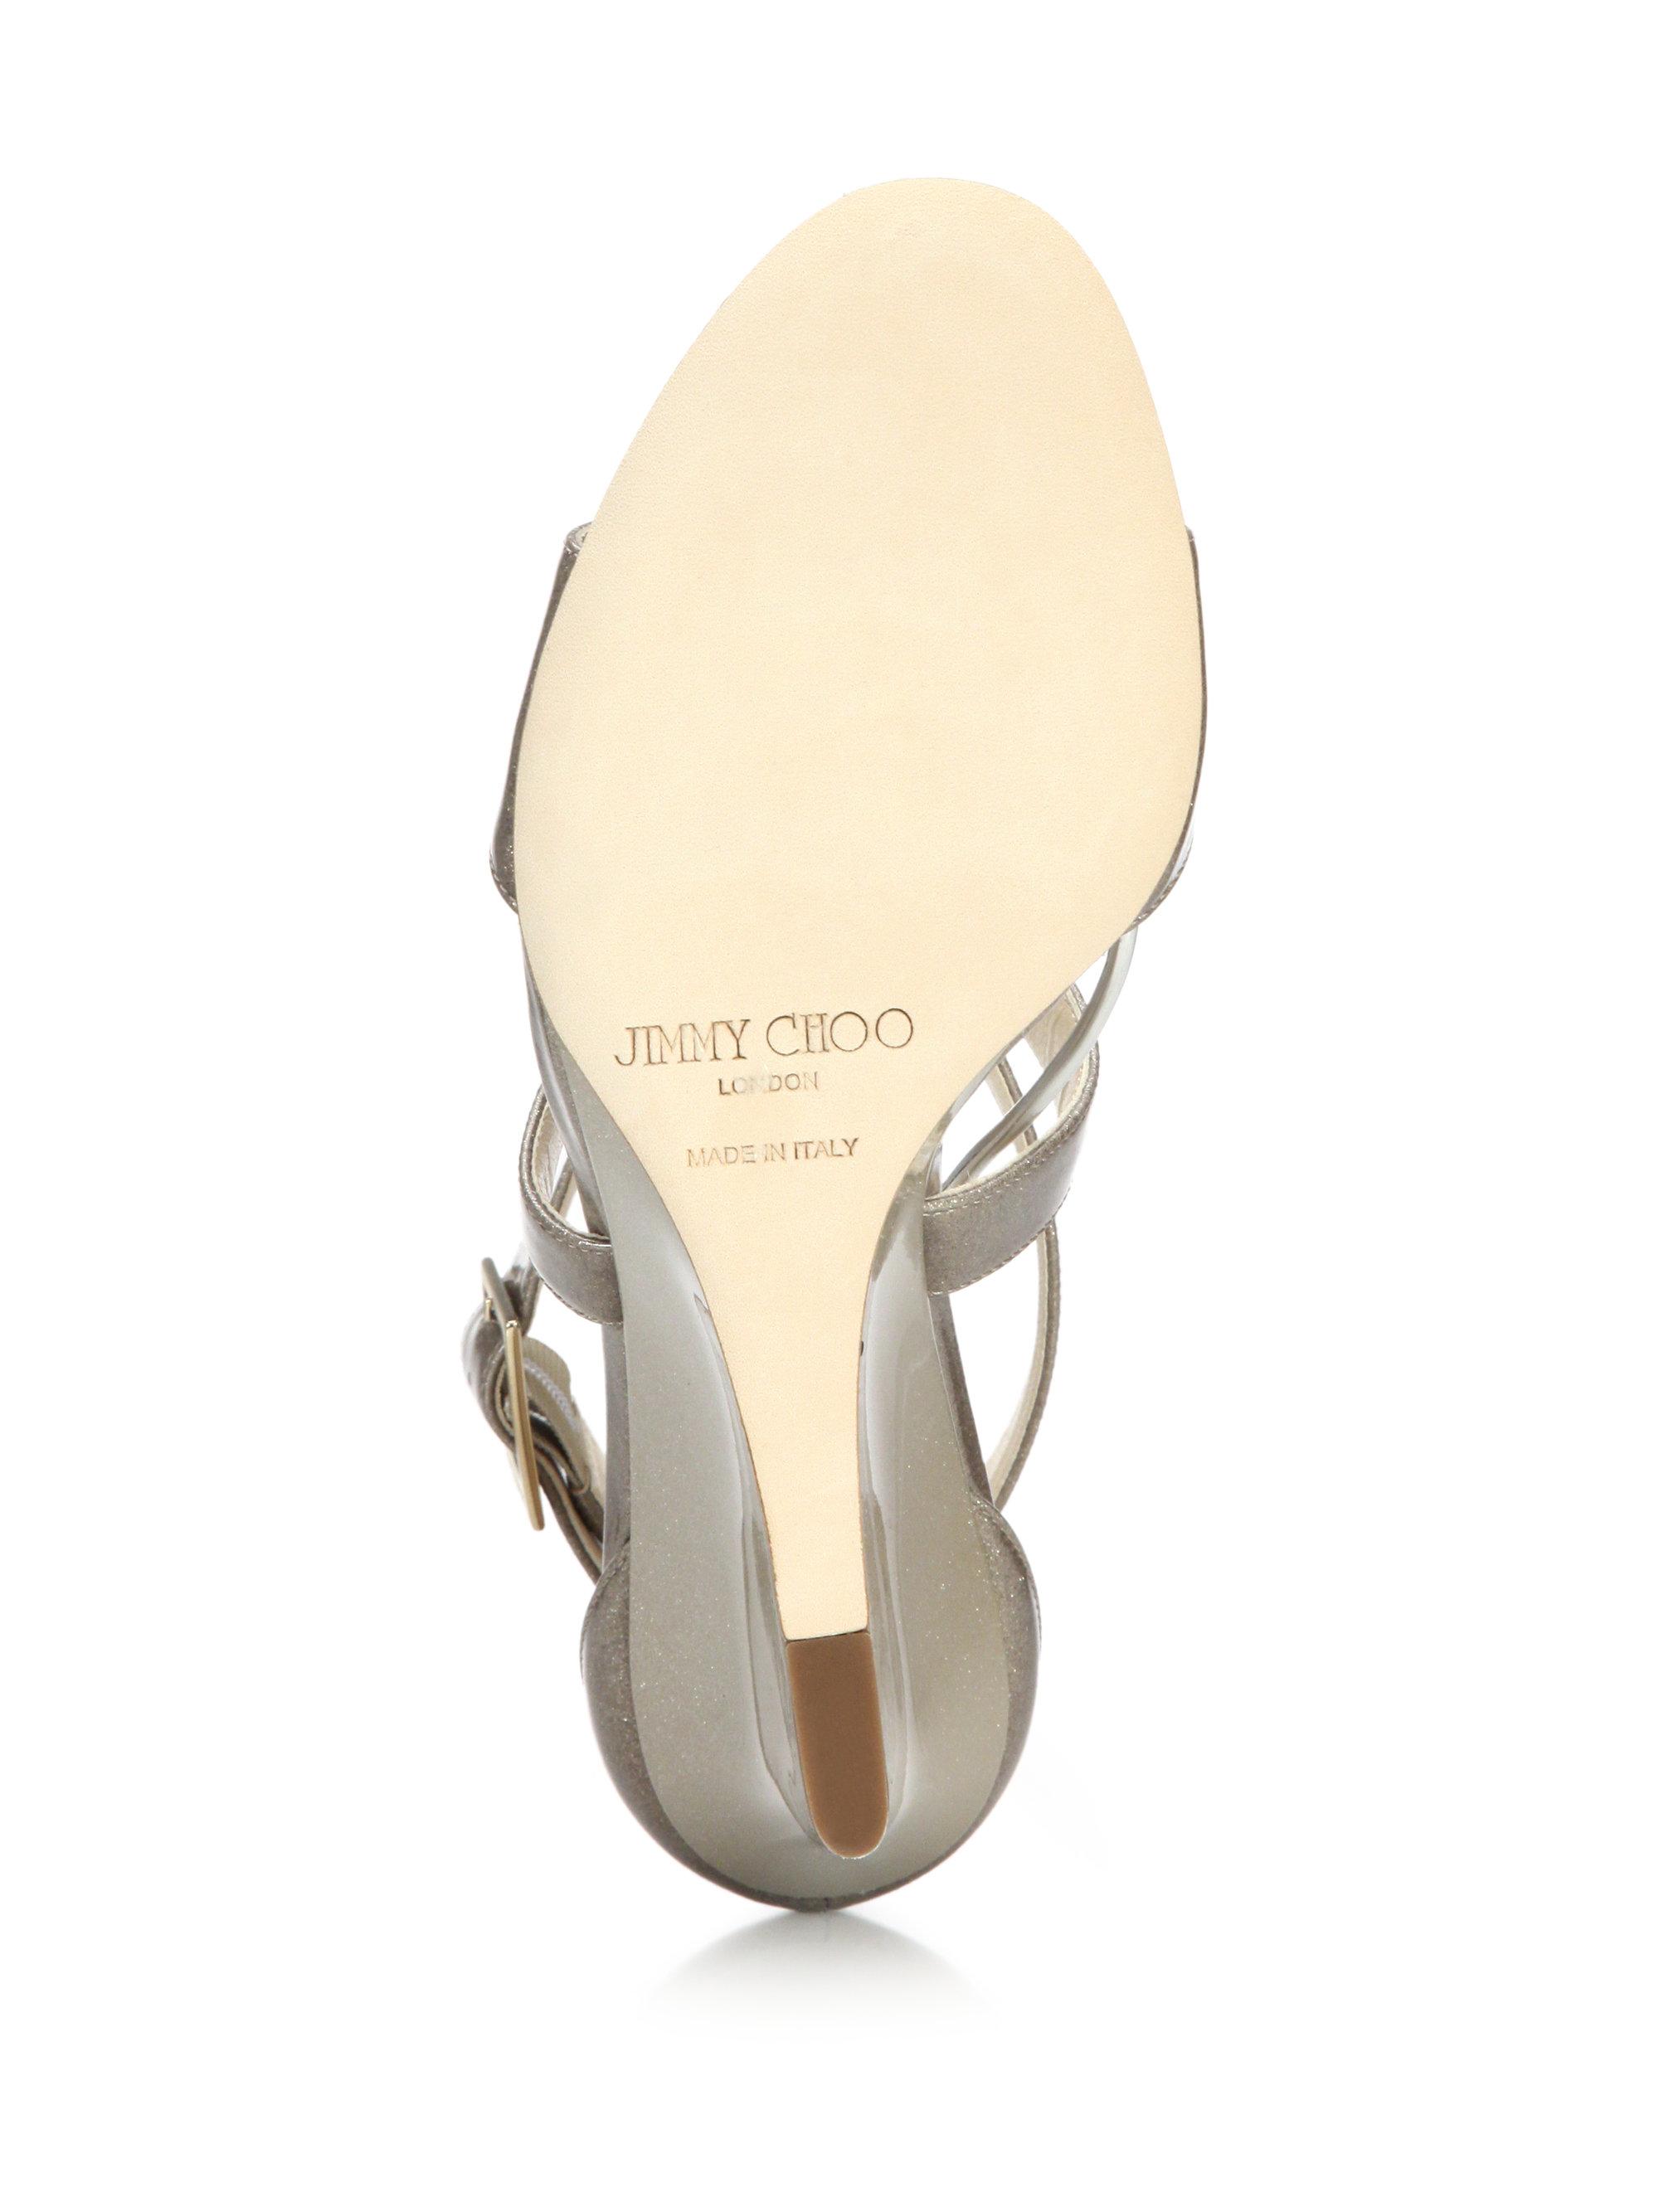 b033290811 Jimmy Choo Fearne Glitter Patent Leather Wedge Sandals in Metallic ...